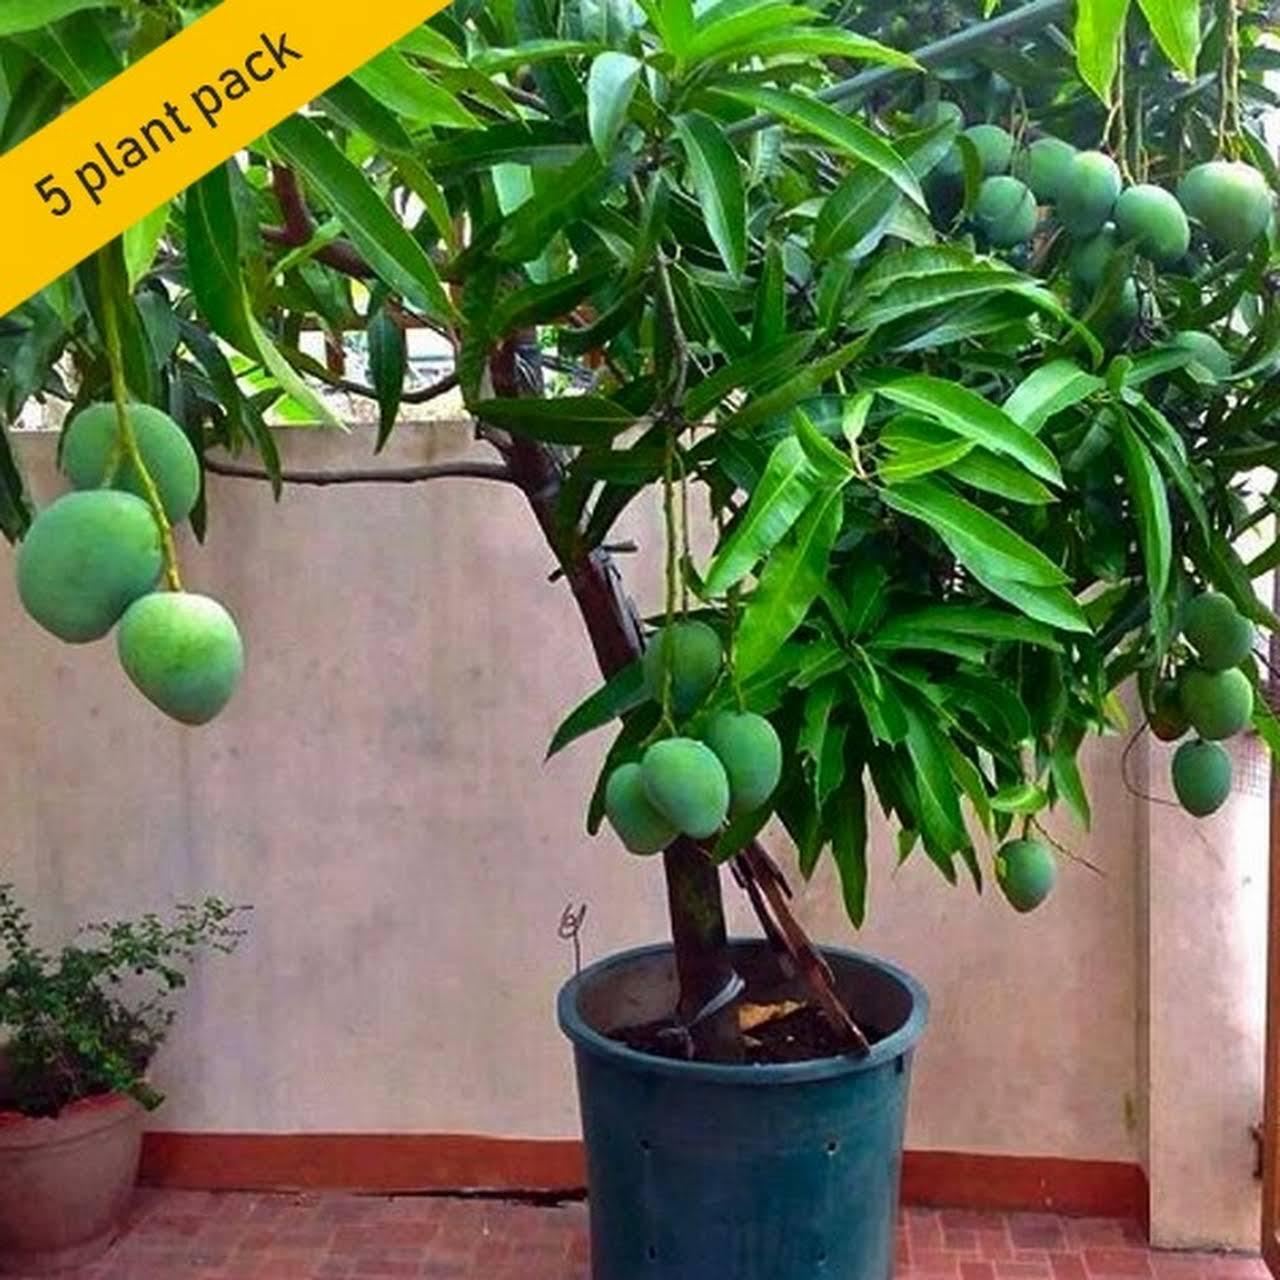 Aiswarya Gardens Mannuthy Thrissur - Nurserys in thrissur | Plant